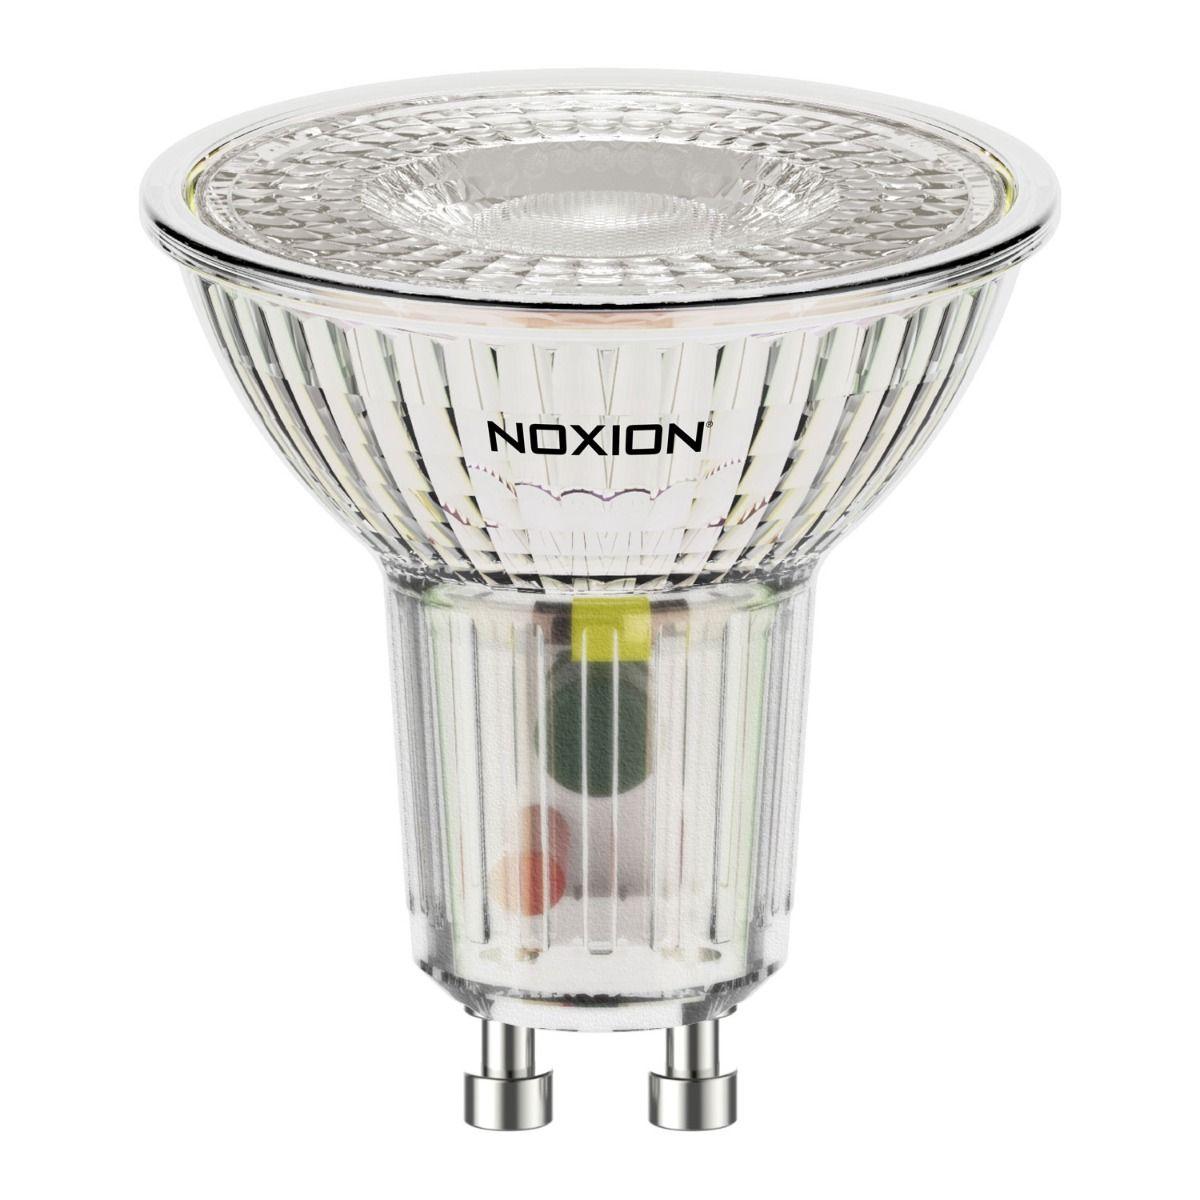 Noxion LED Spot GU10 4W 840 36D 400lm | Replacer for 50W